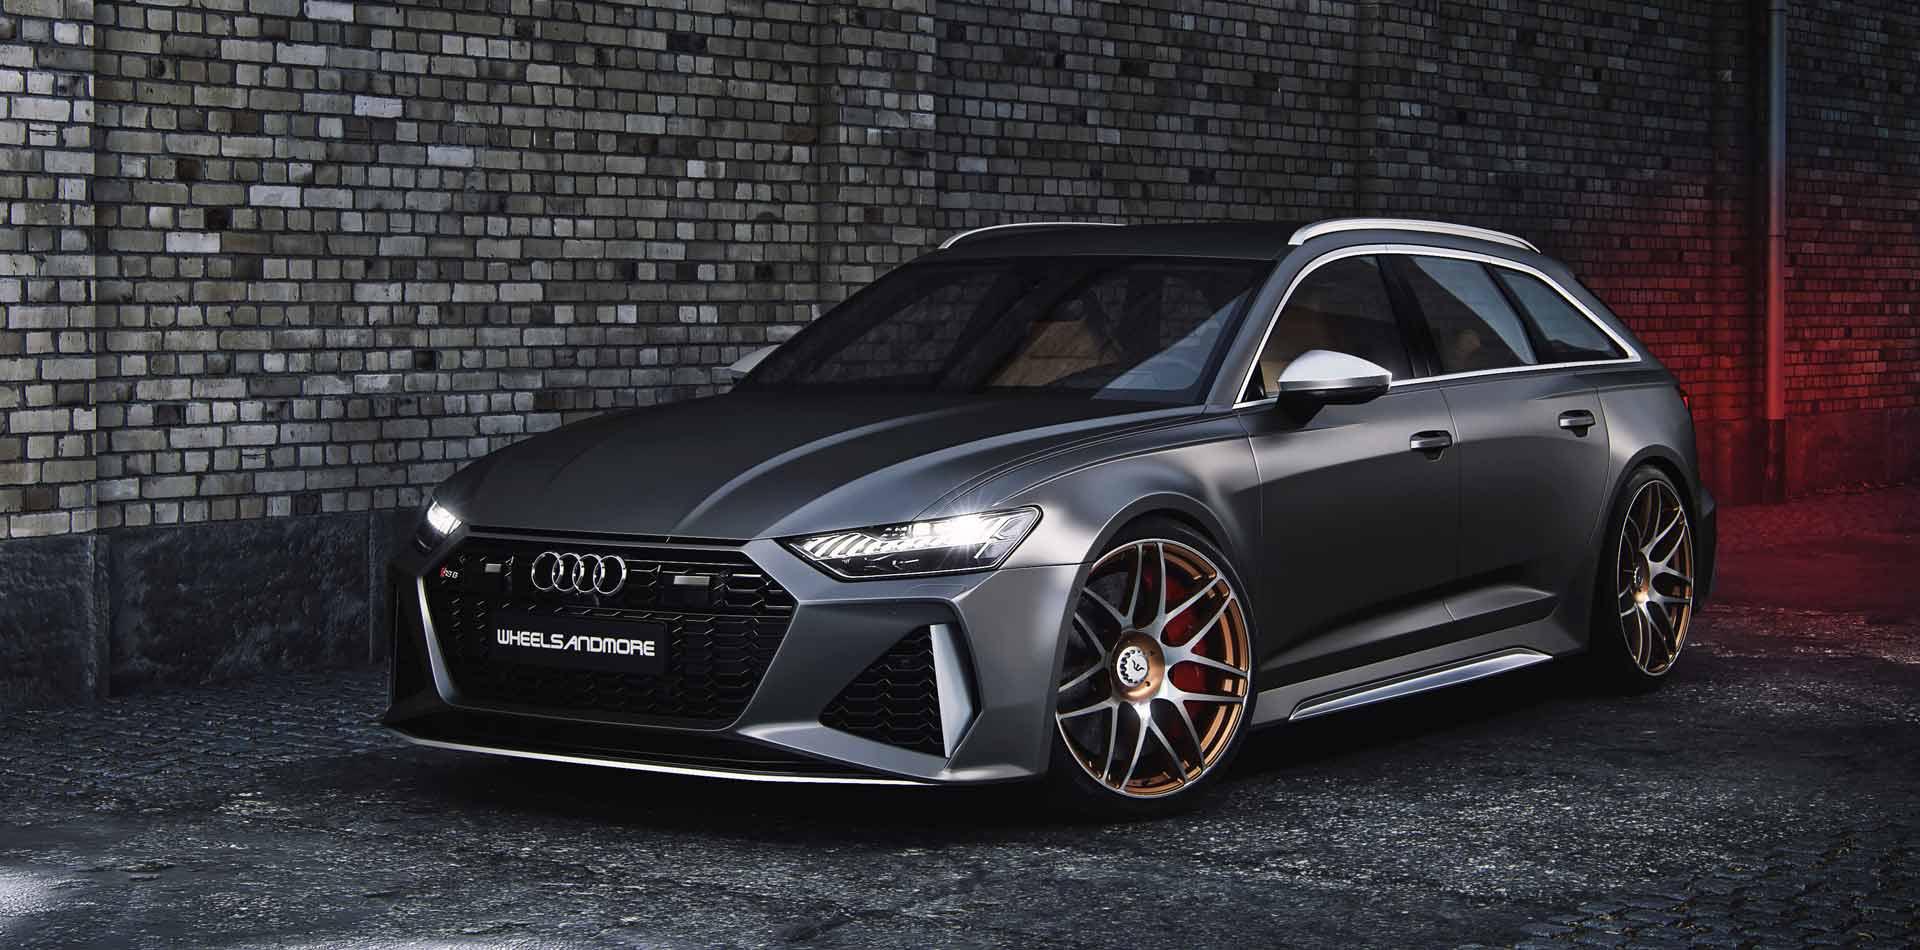 Audi-RS6-Avant-by-Wheelsandmore-3